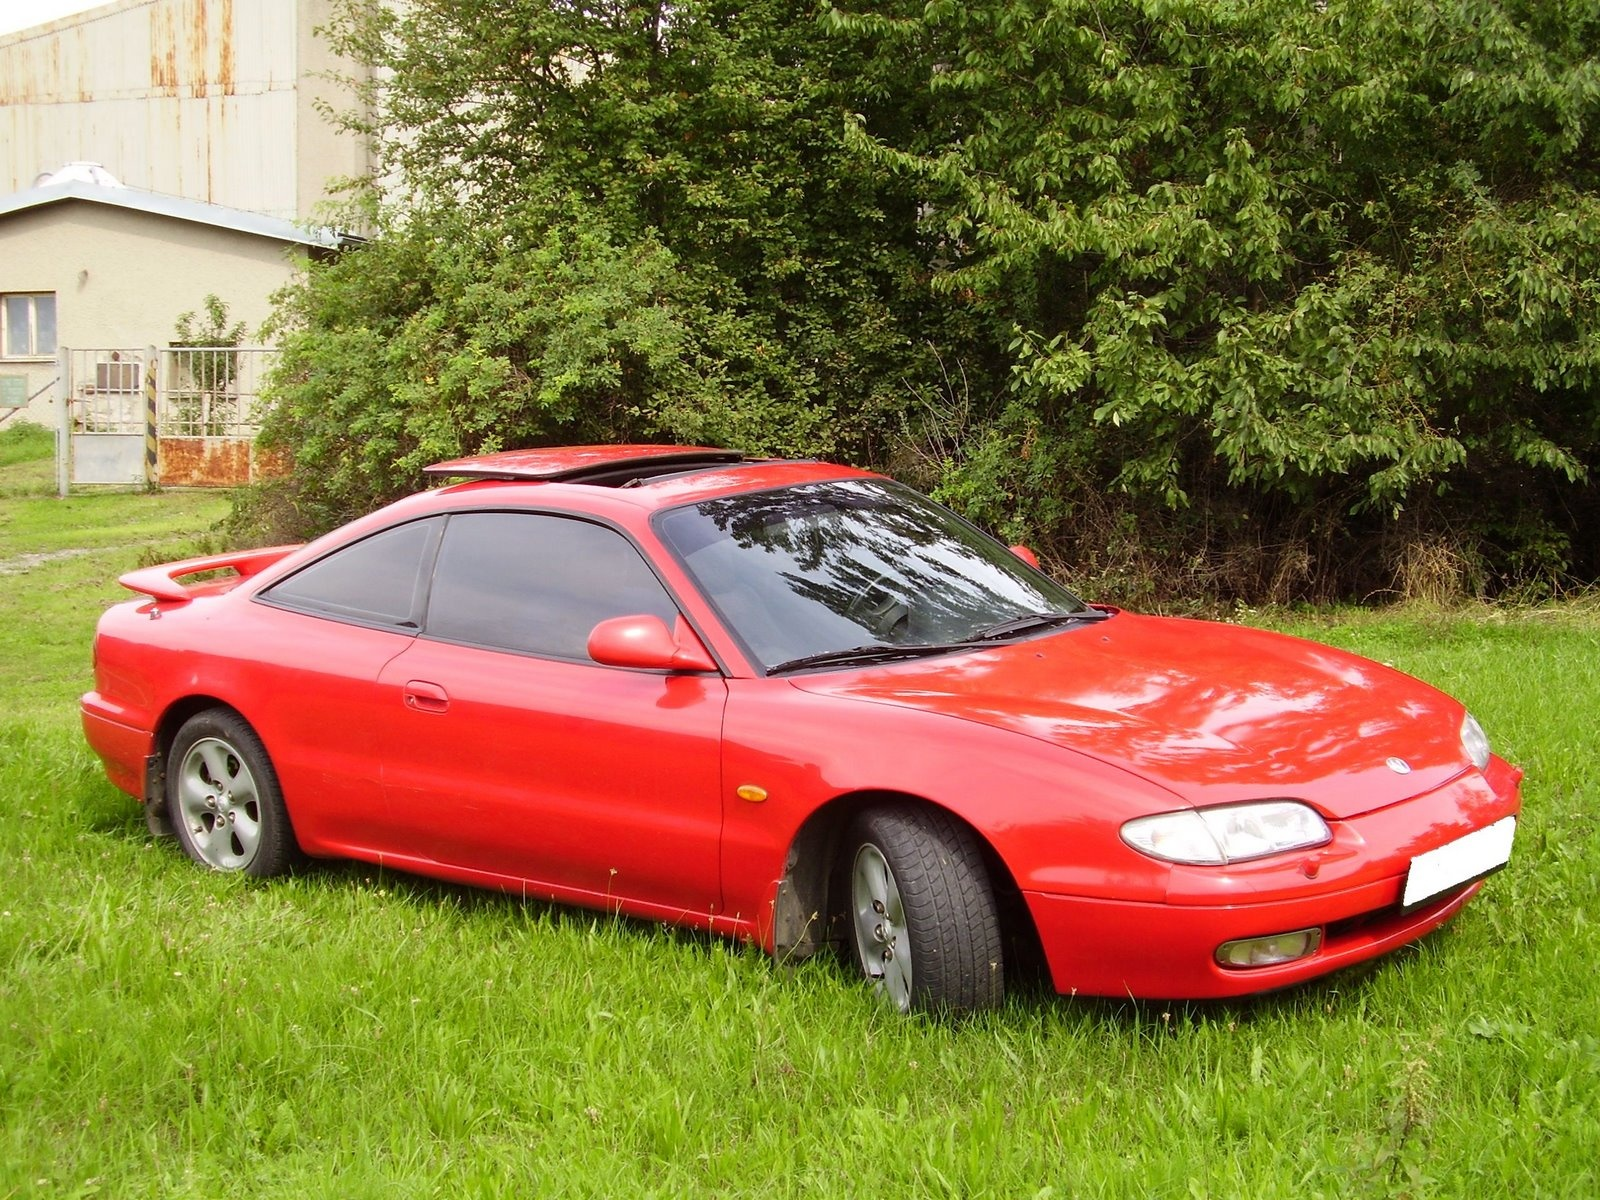 1997 Mazda Mx 6 Overview Cargurus